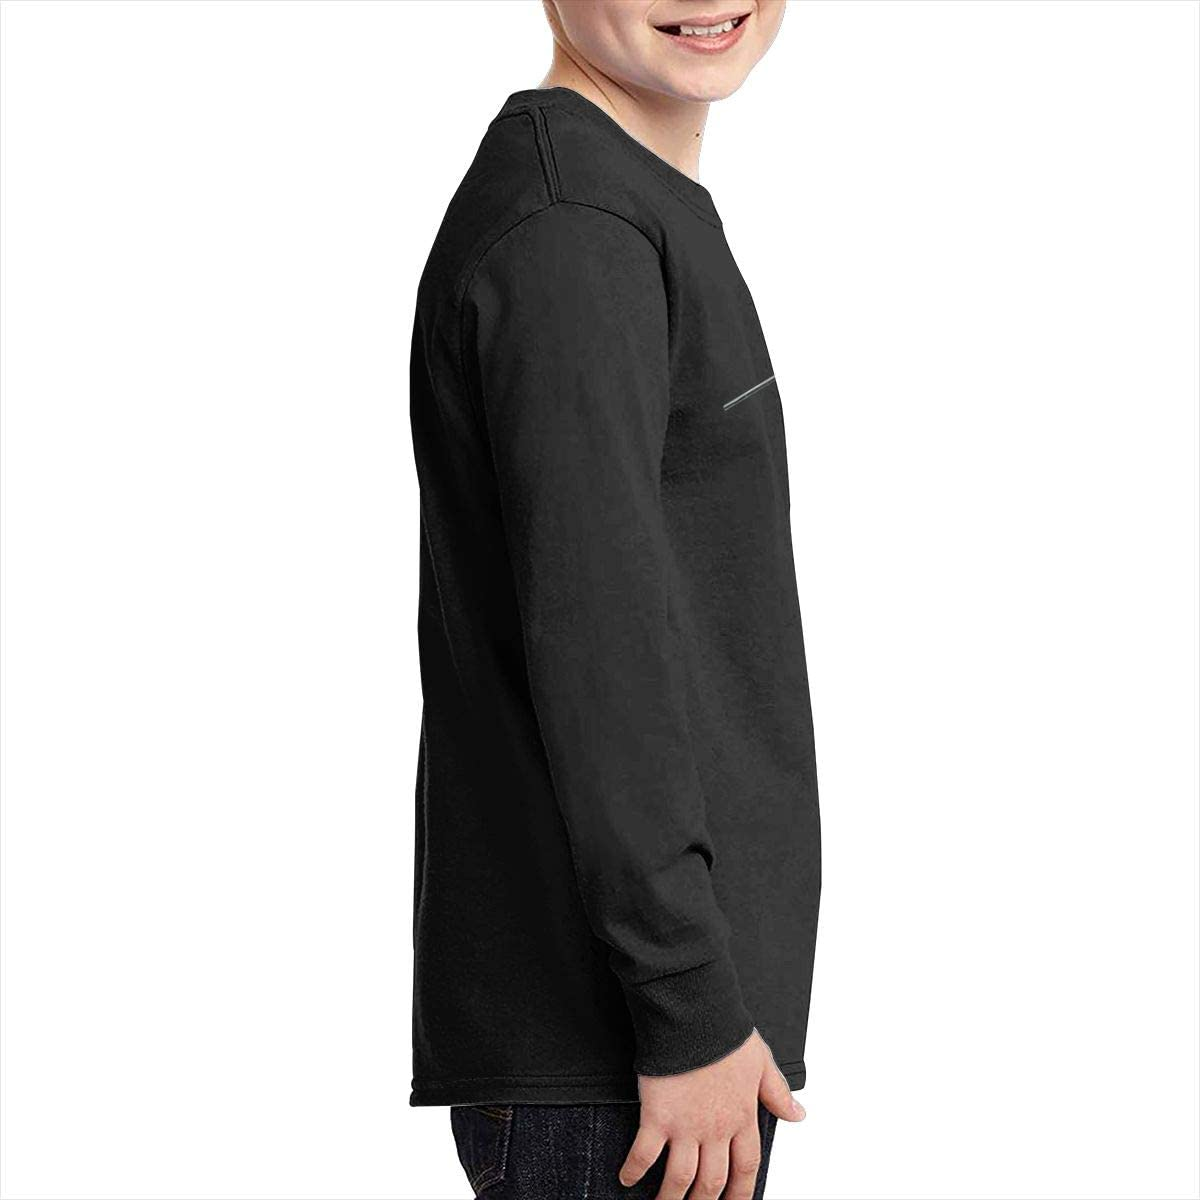 Gambit Boys Fashion Classic Long Sleeve T-Shirt Boy Long Sleeve Cotton Round Neck T-Shirt